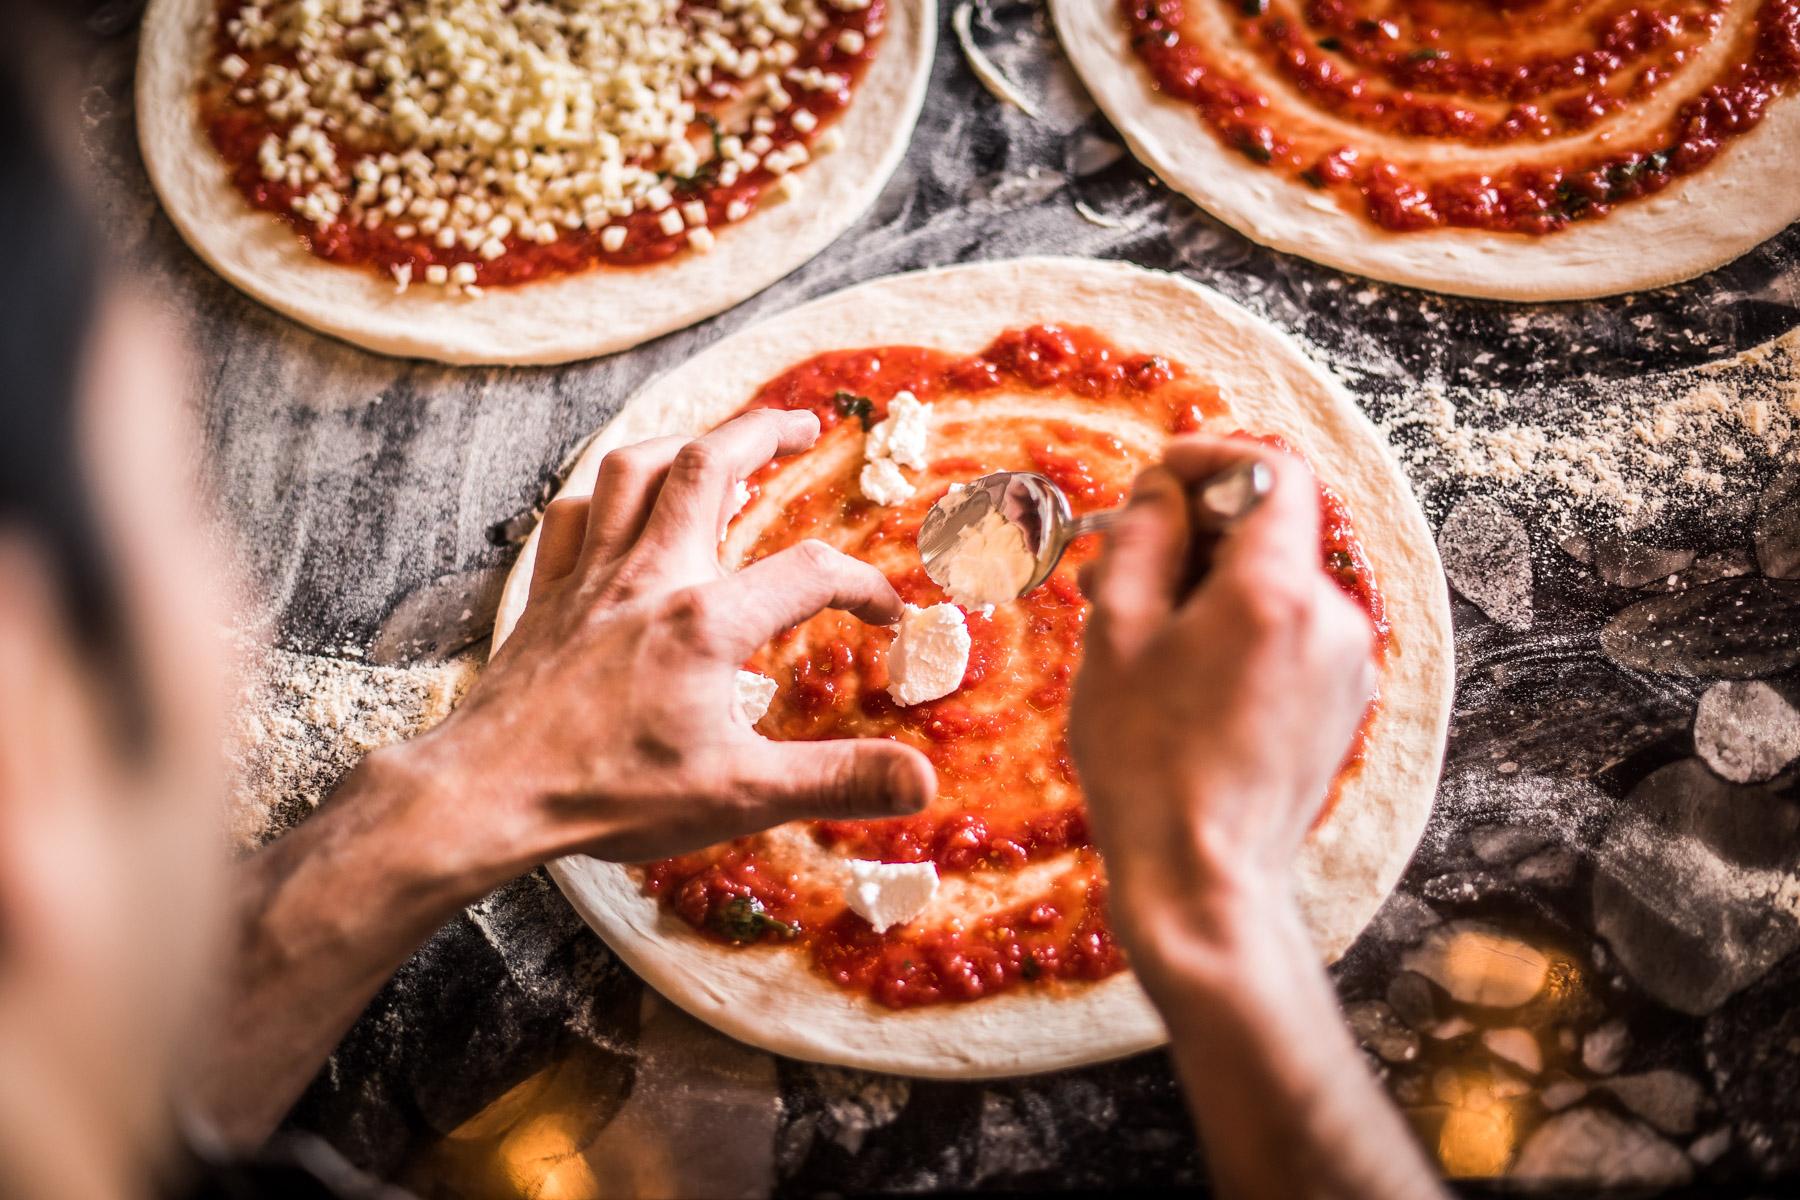 pizza-making-in-bath.jpg